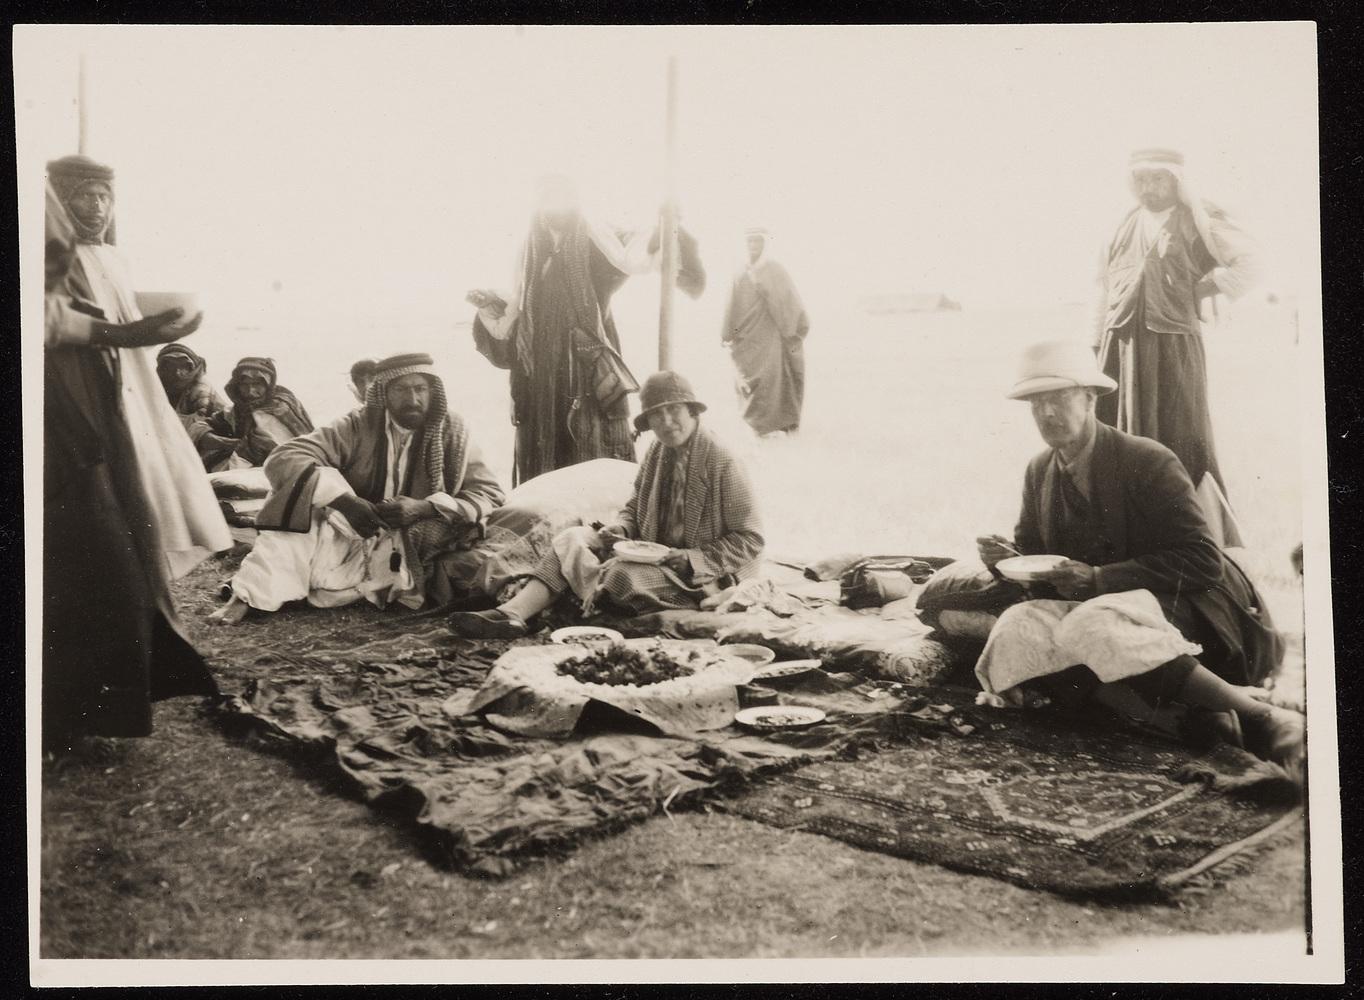 Stefana Drower with a Bedawi Sheikh, probably Shammar. Iraq, c. 1920s